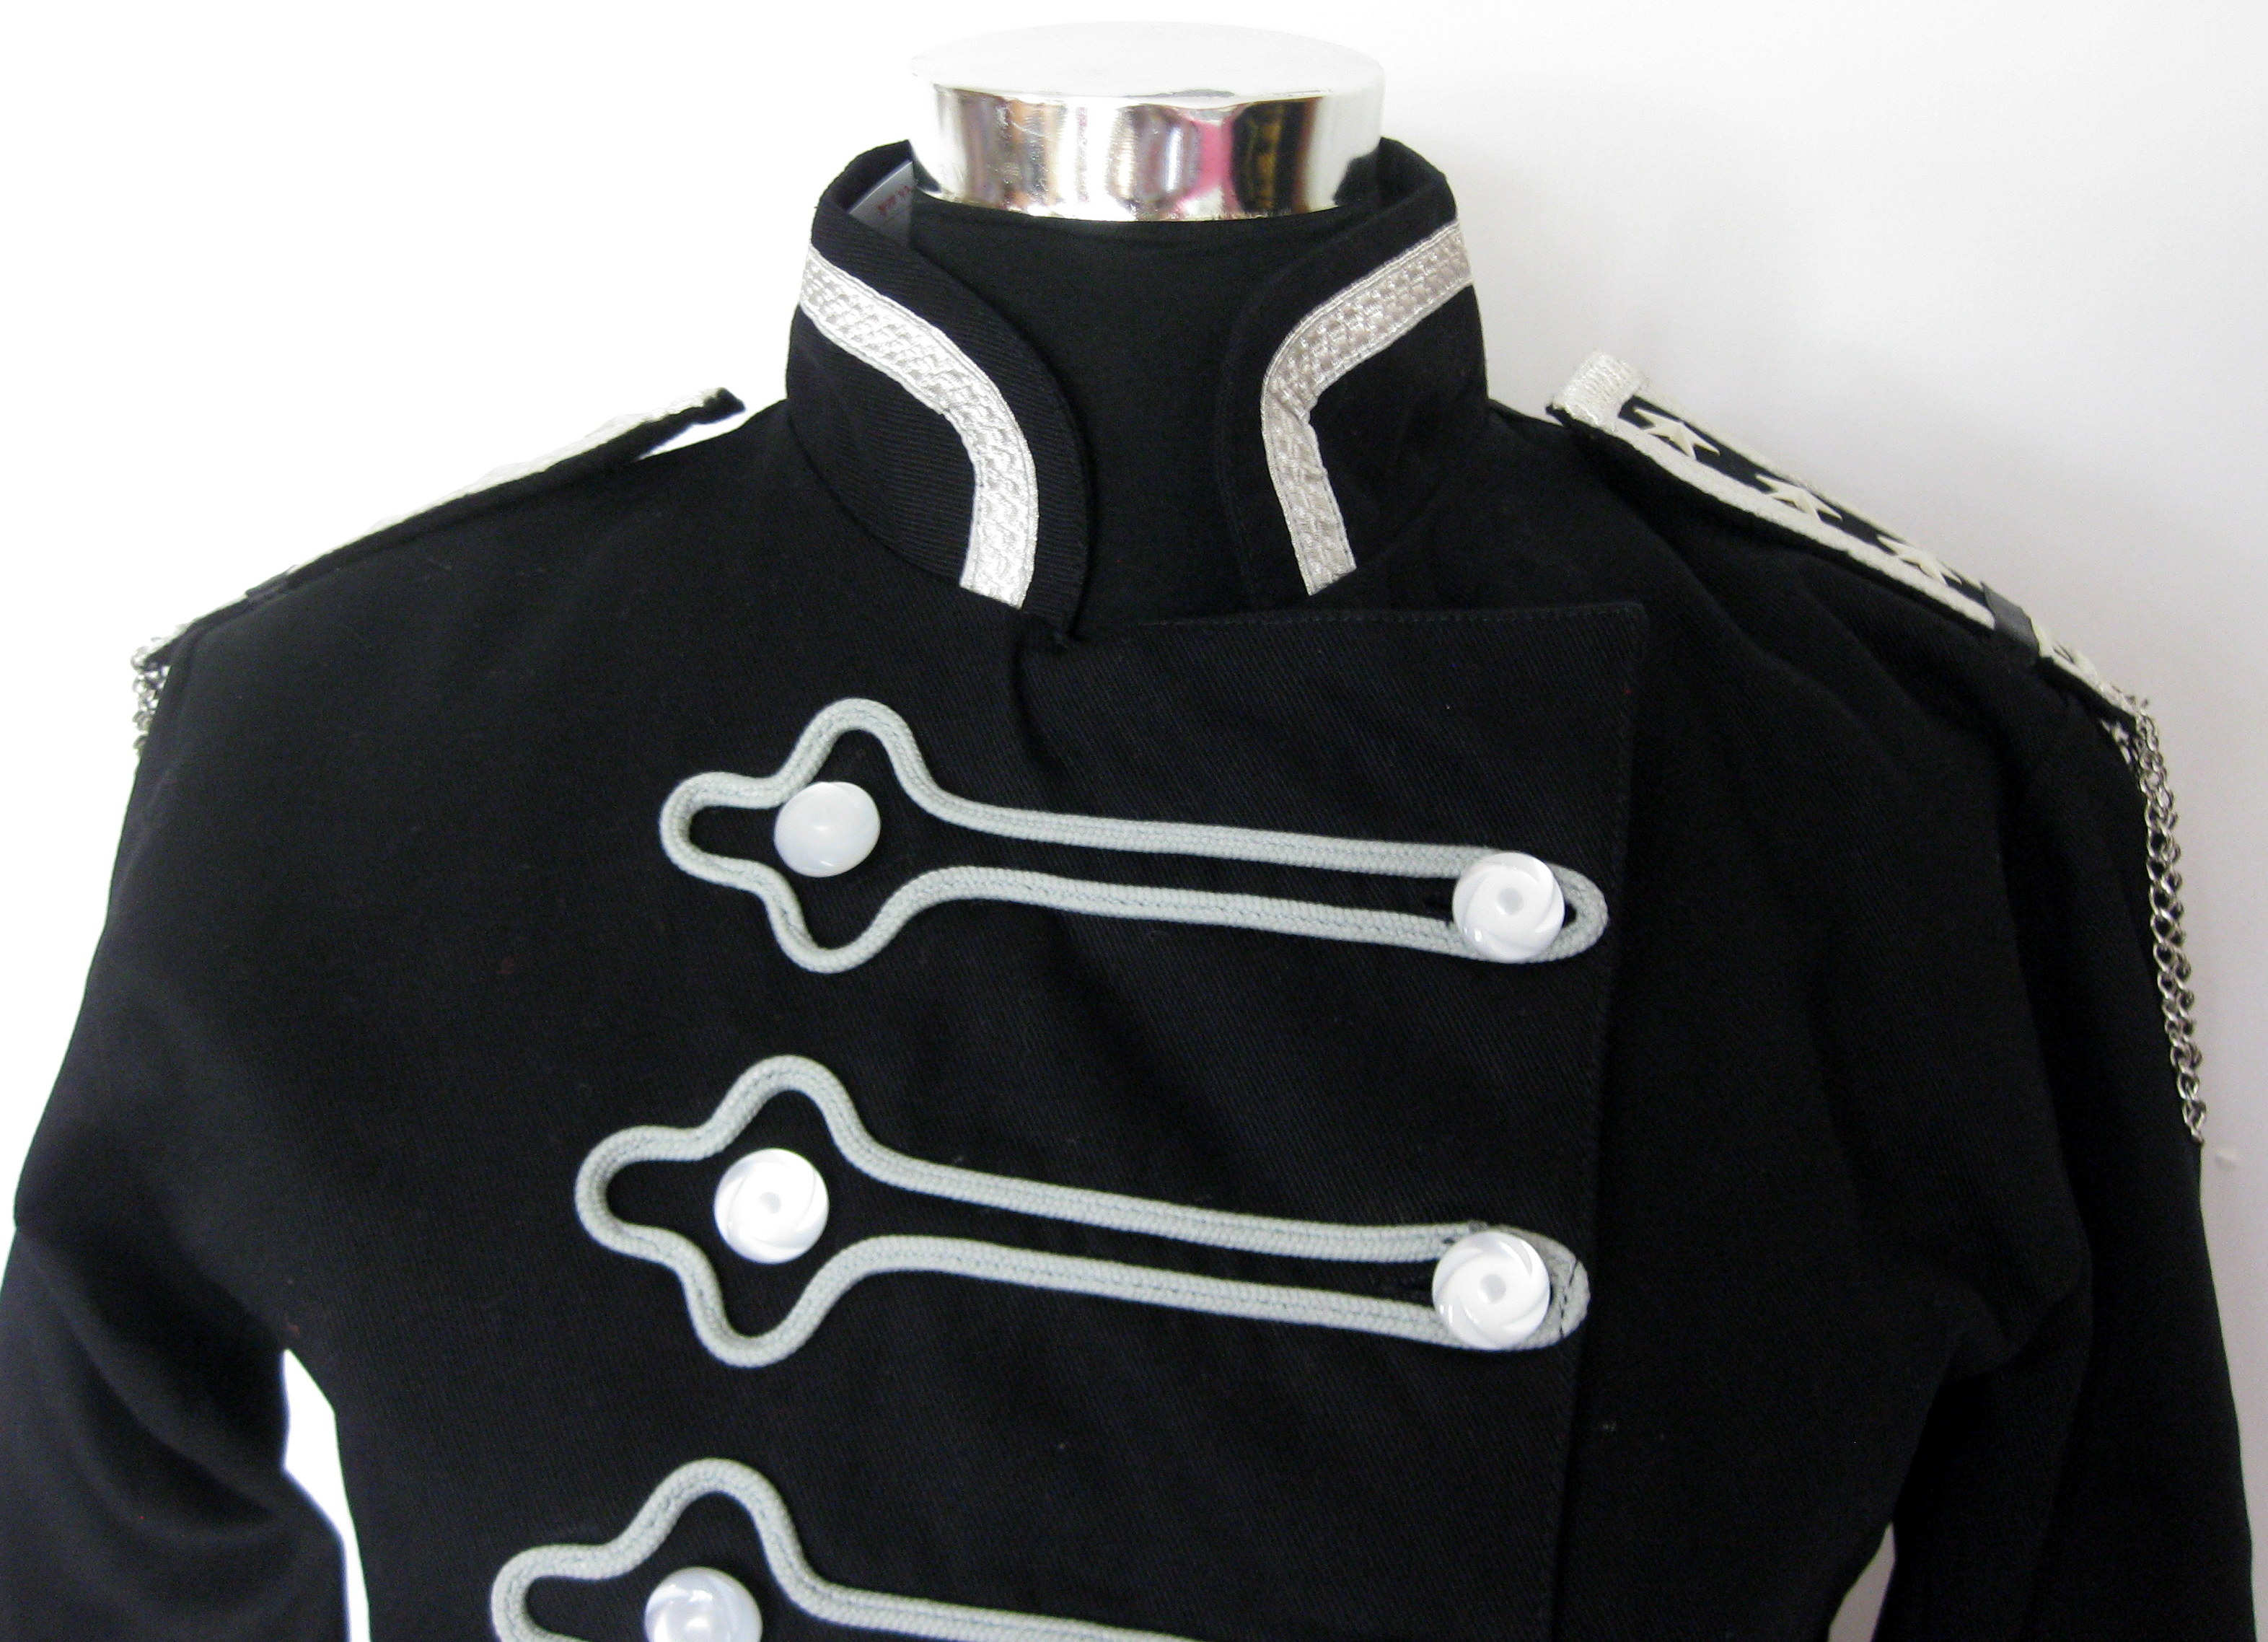 kendall_military_band_style_jacket_black_silver_jackets_3.JPG